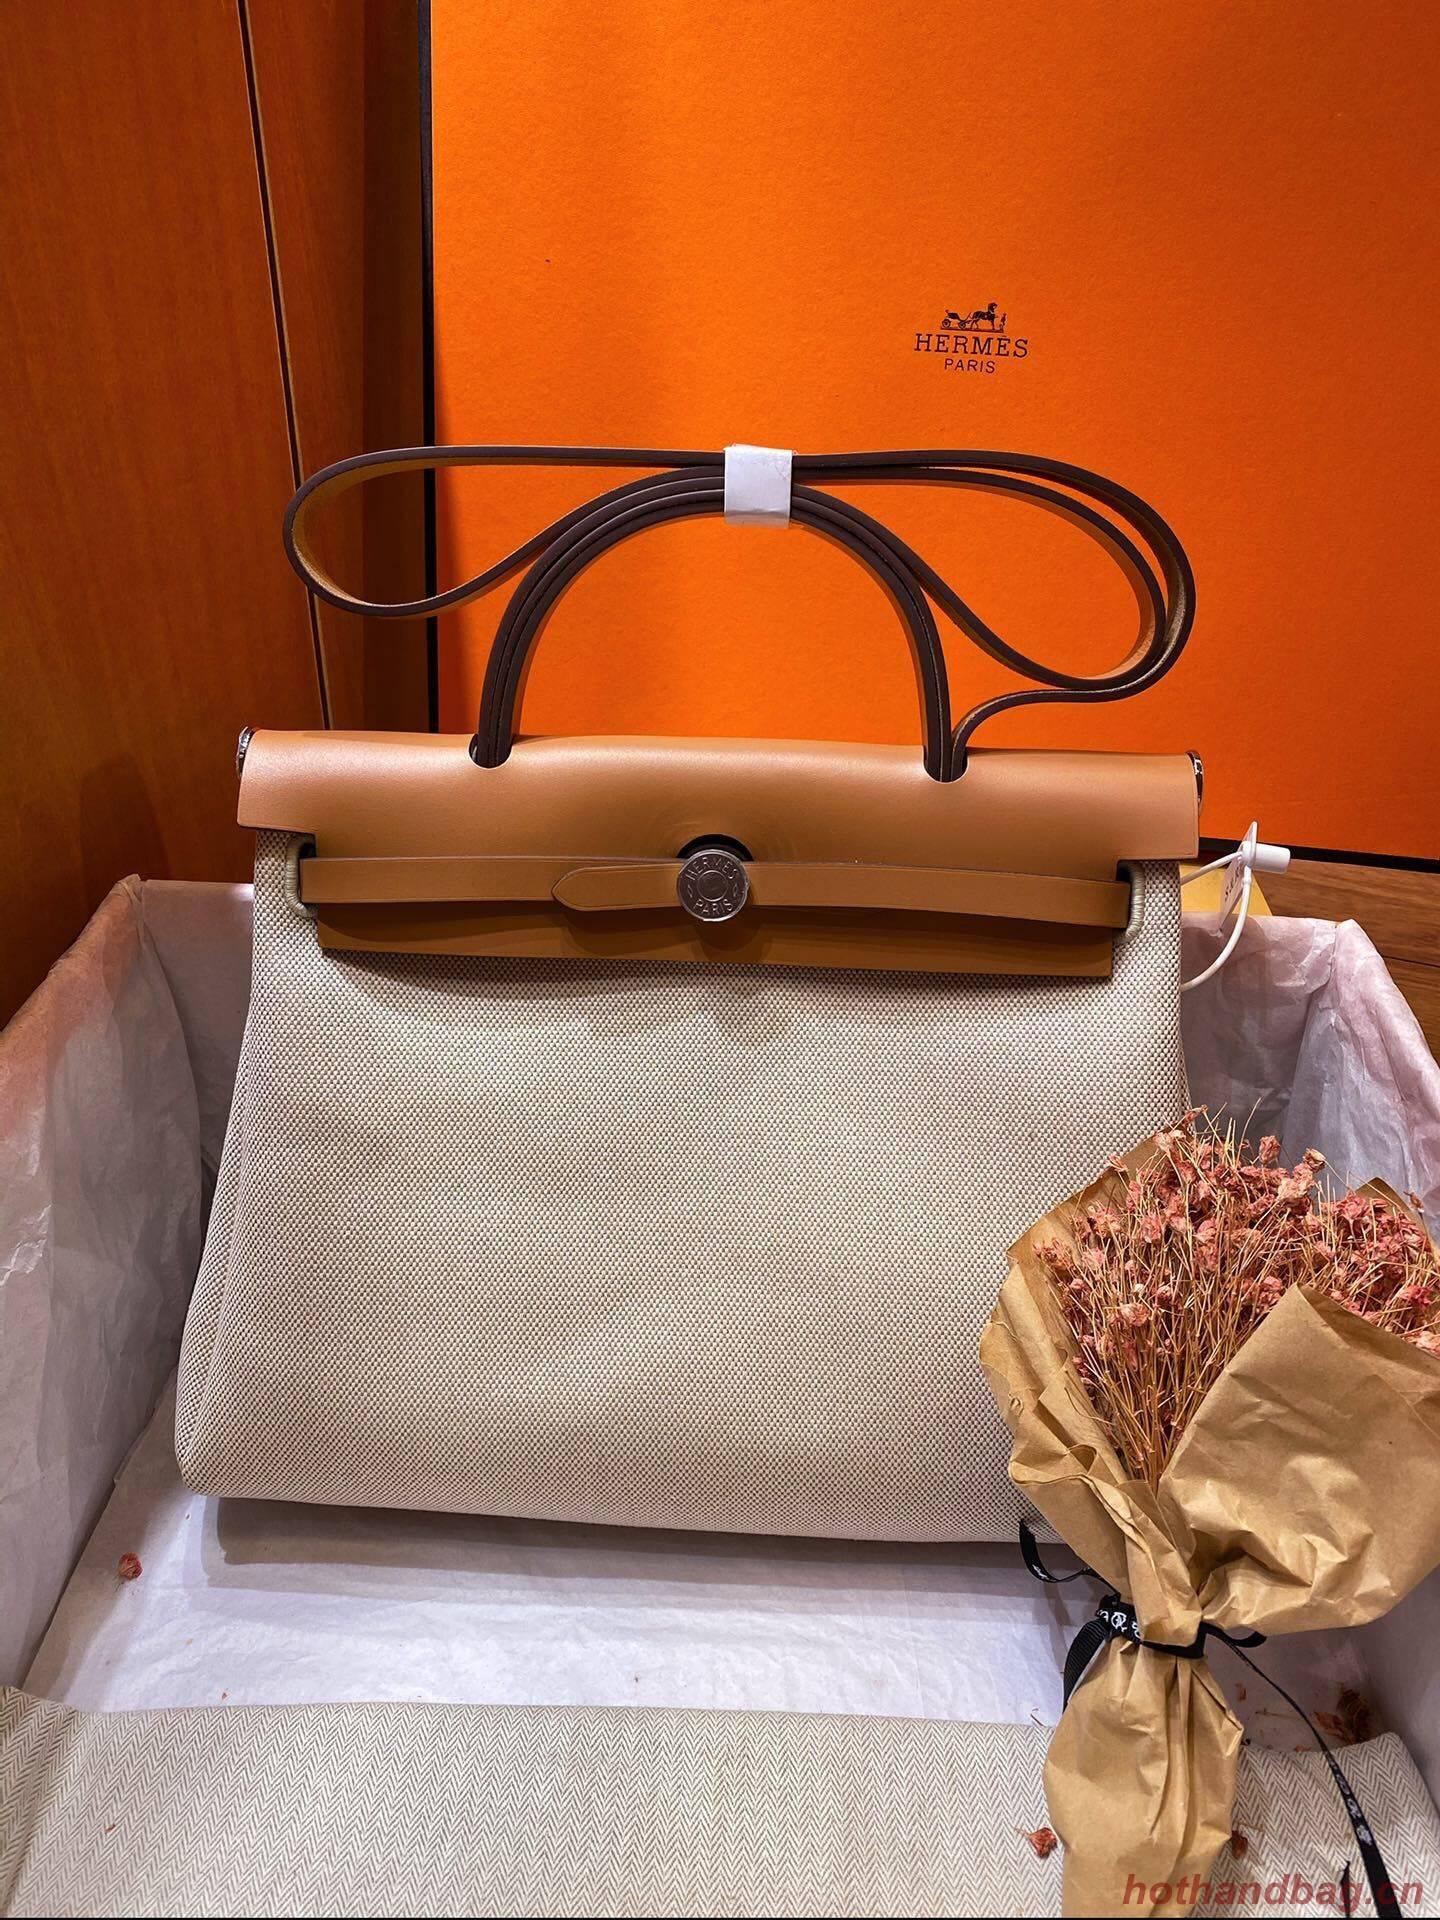 Hermes Herbag 31CM Original Canvas Leather & Calfskin 45988 brown&white